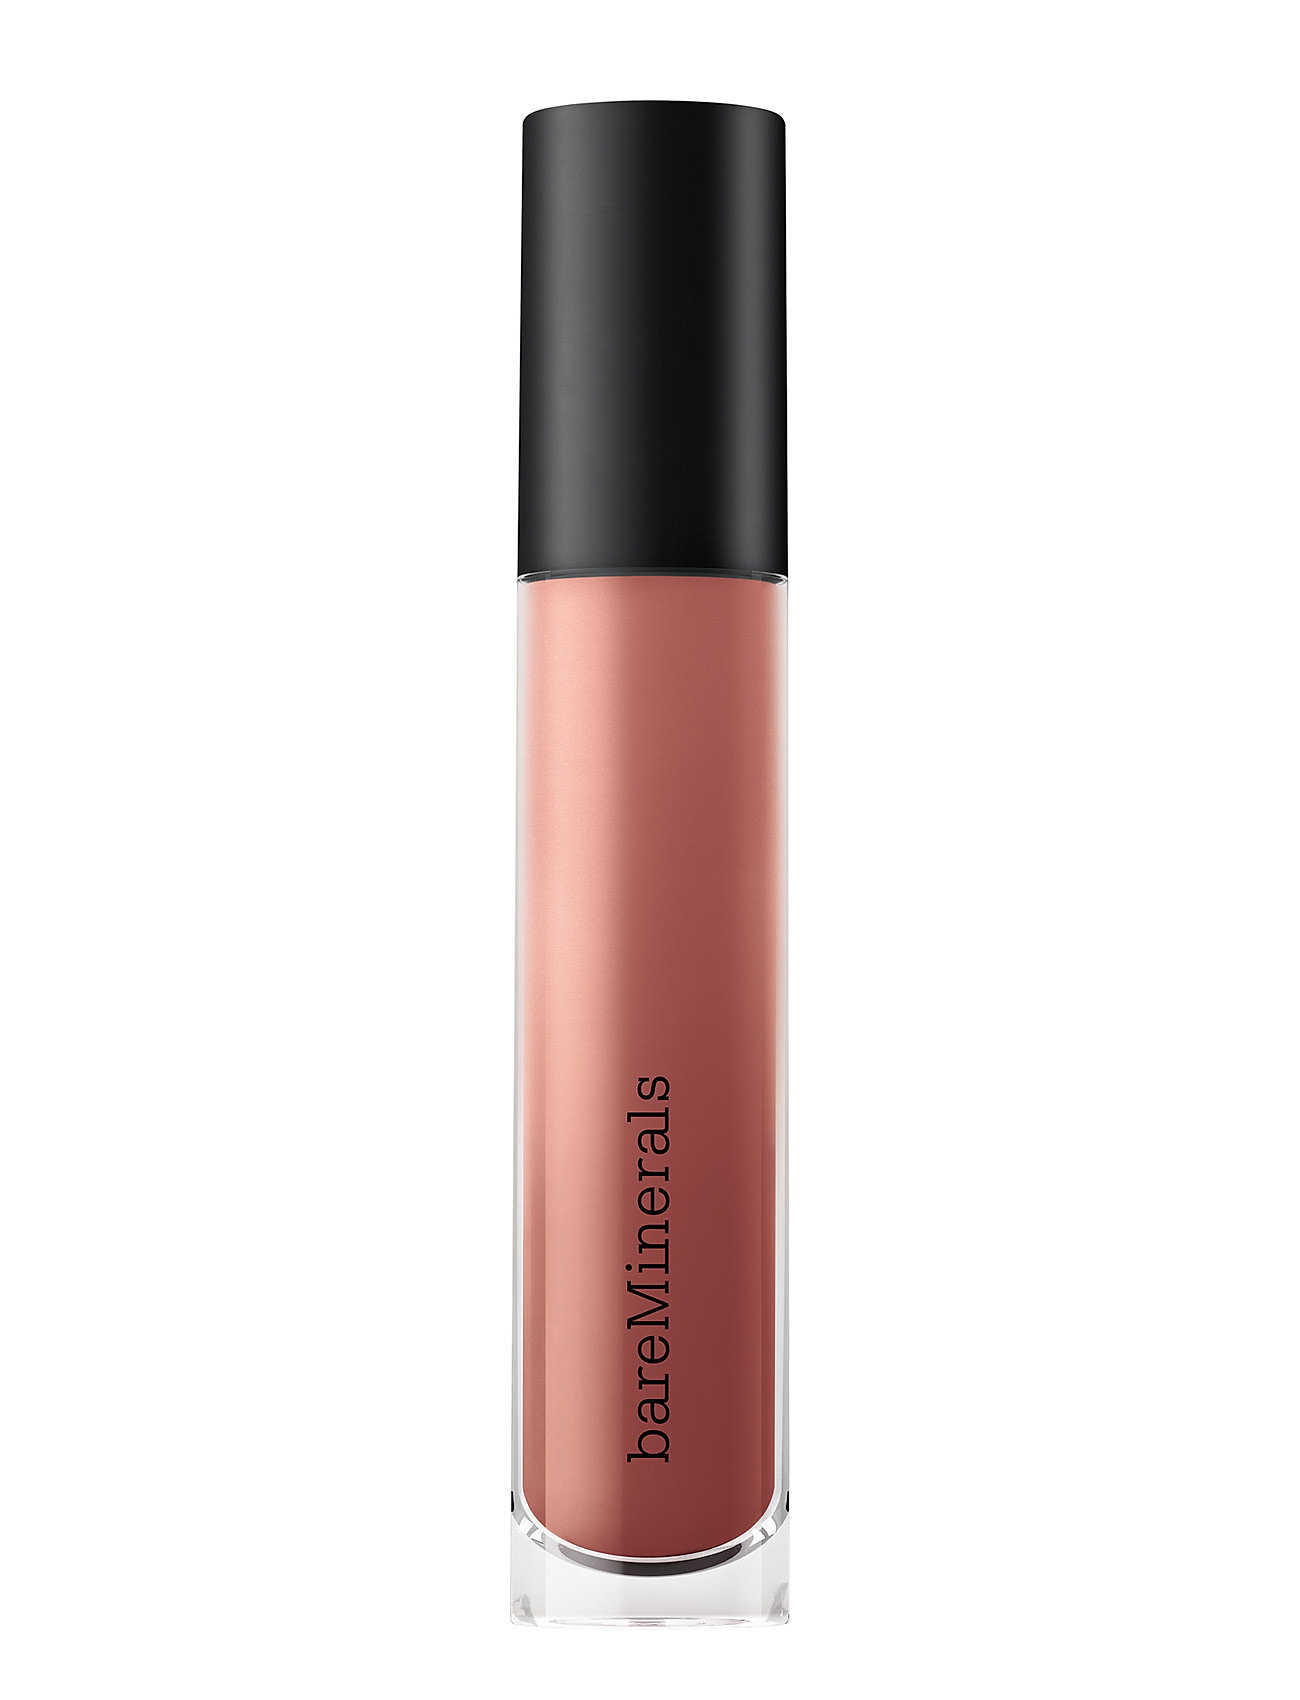 Image of Gen Nude Matte Liquid Lipcolor Læbestift Makeup Lyserød BareMinerals (3067521977)